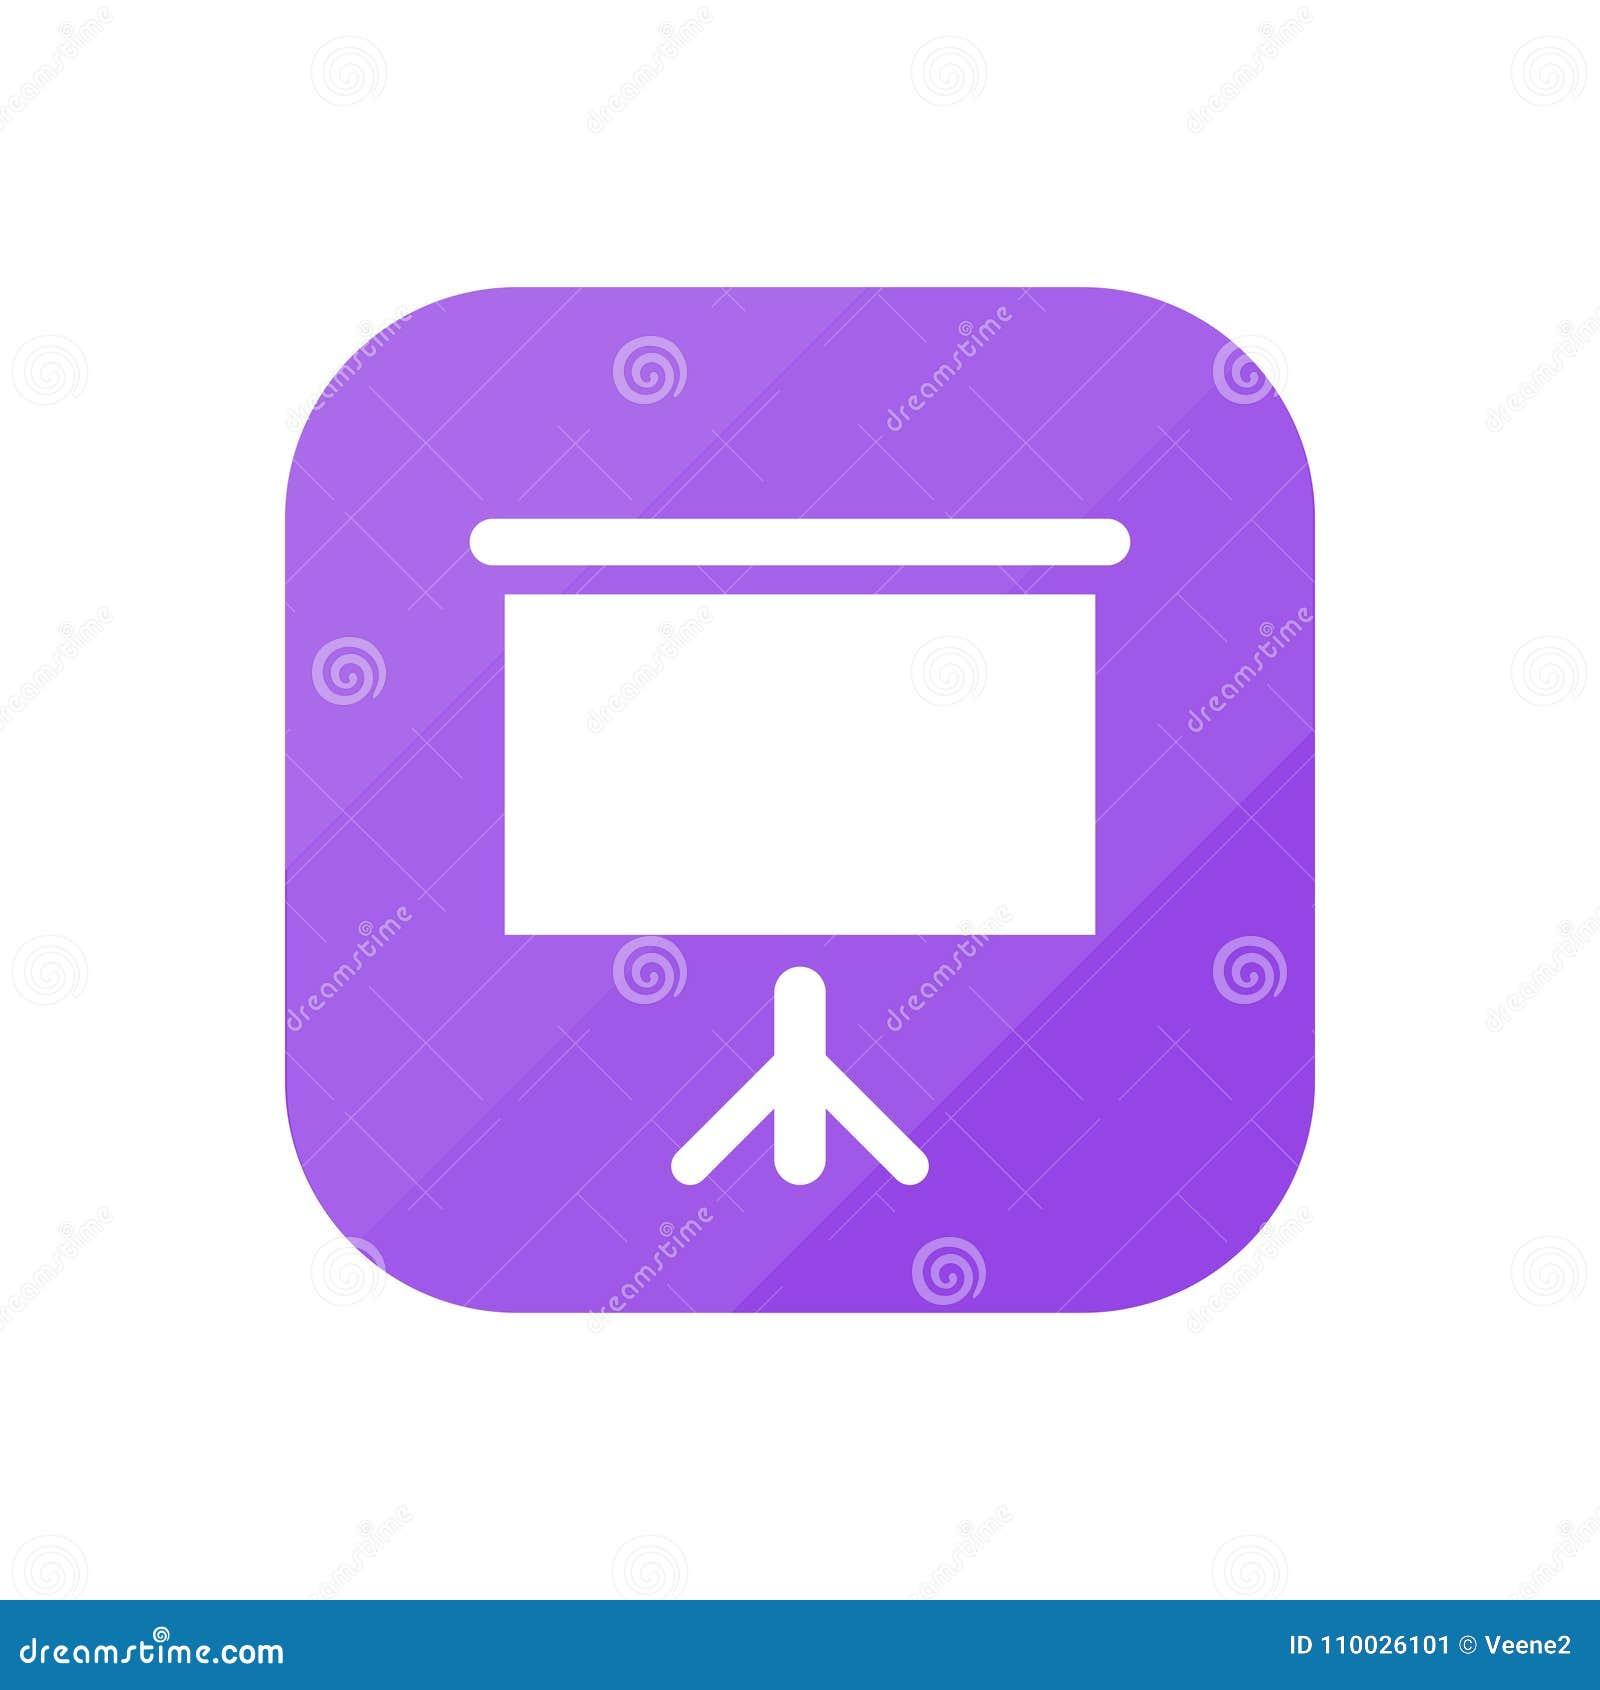 Slideshow - App Pictogram